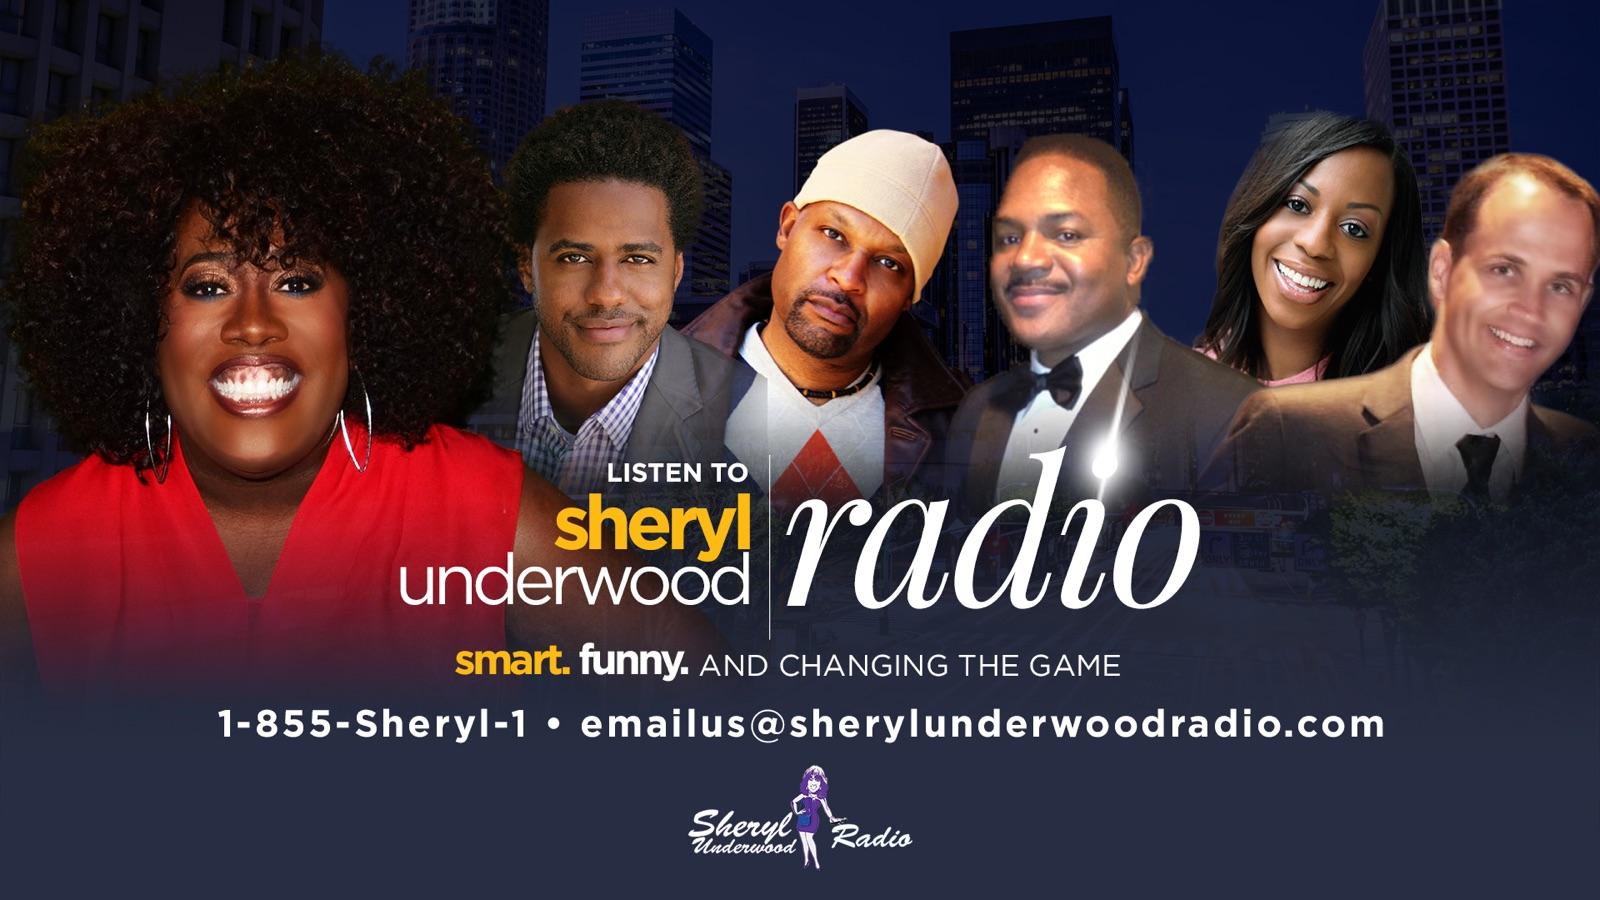 Art for 34sec by (7) Sheryl Underwood Radio (wk roundup) 013120 2hr